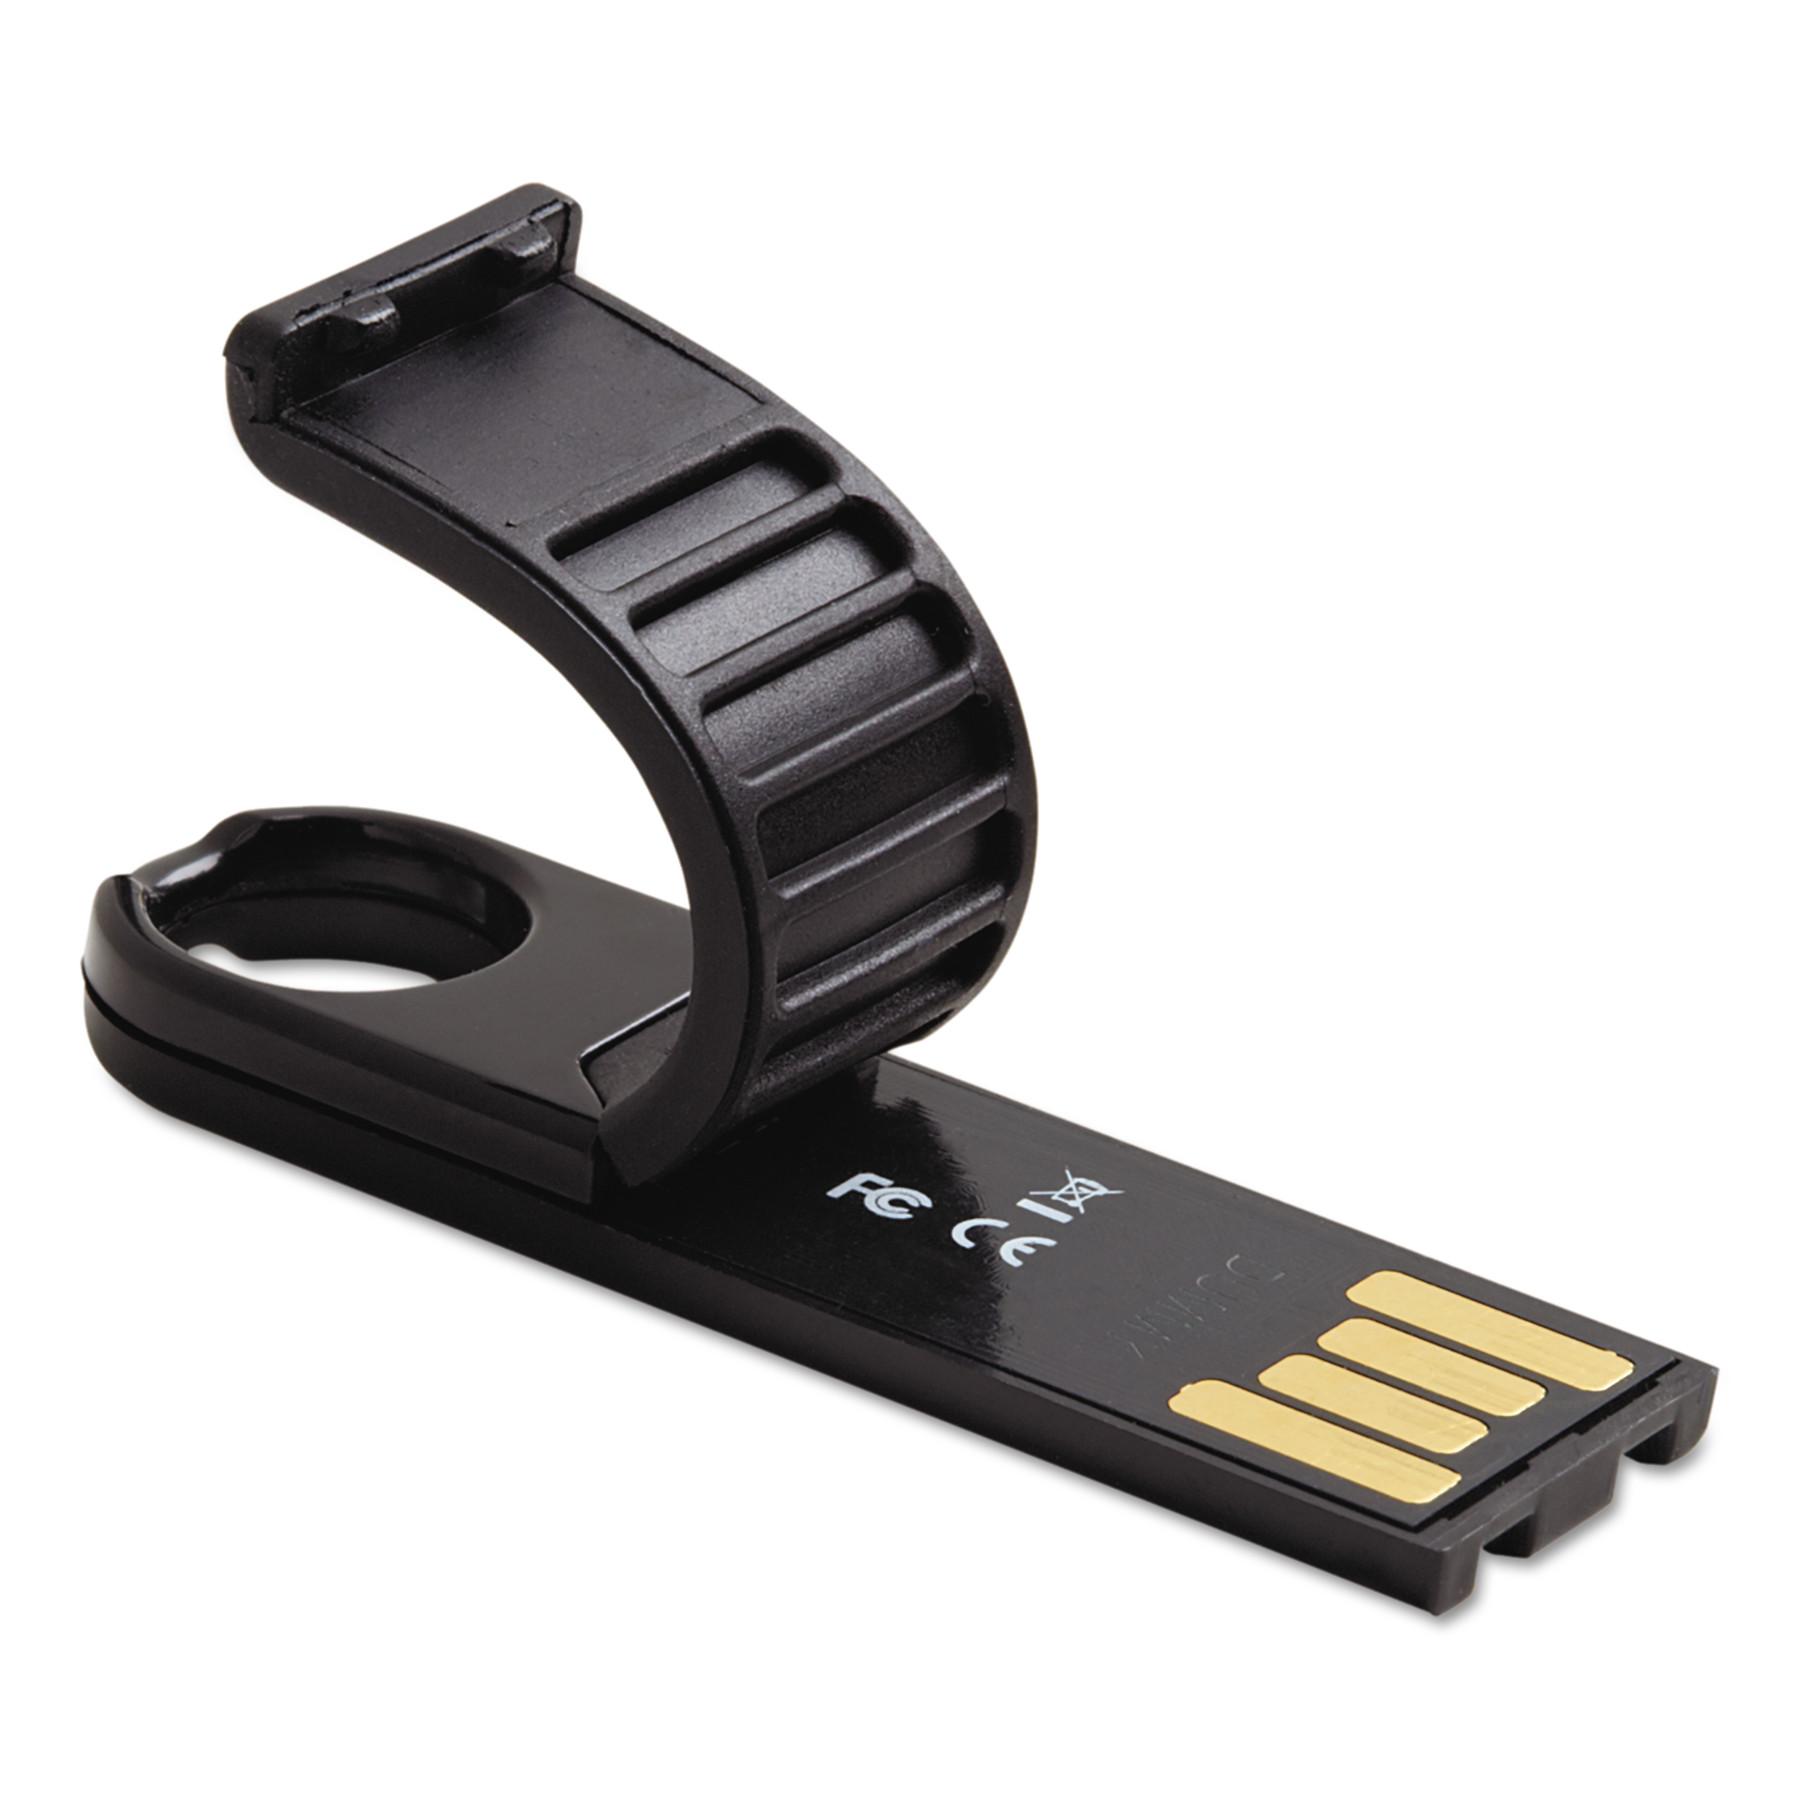 Verbatim Store 'n' Go Micro USB 2.0 Drive Plus, 32GB, Black -VER97763